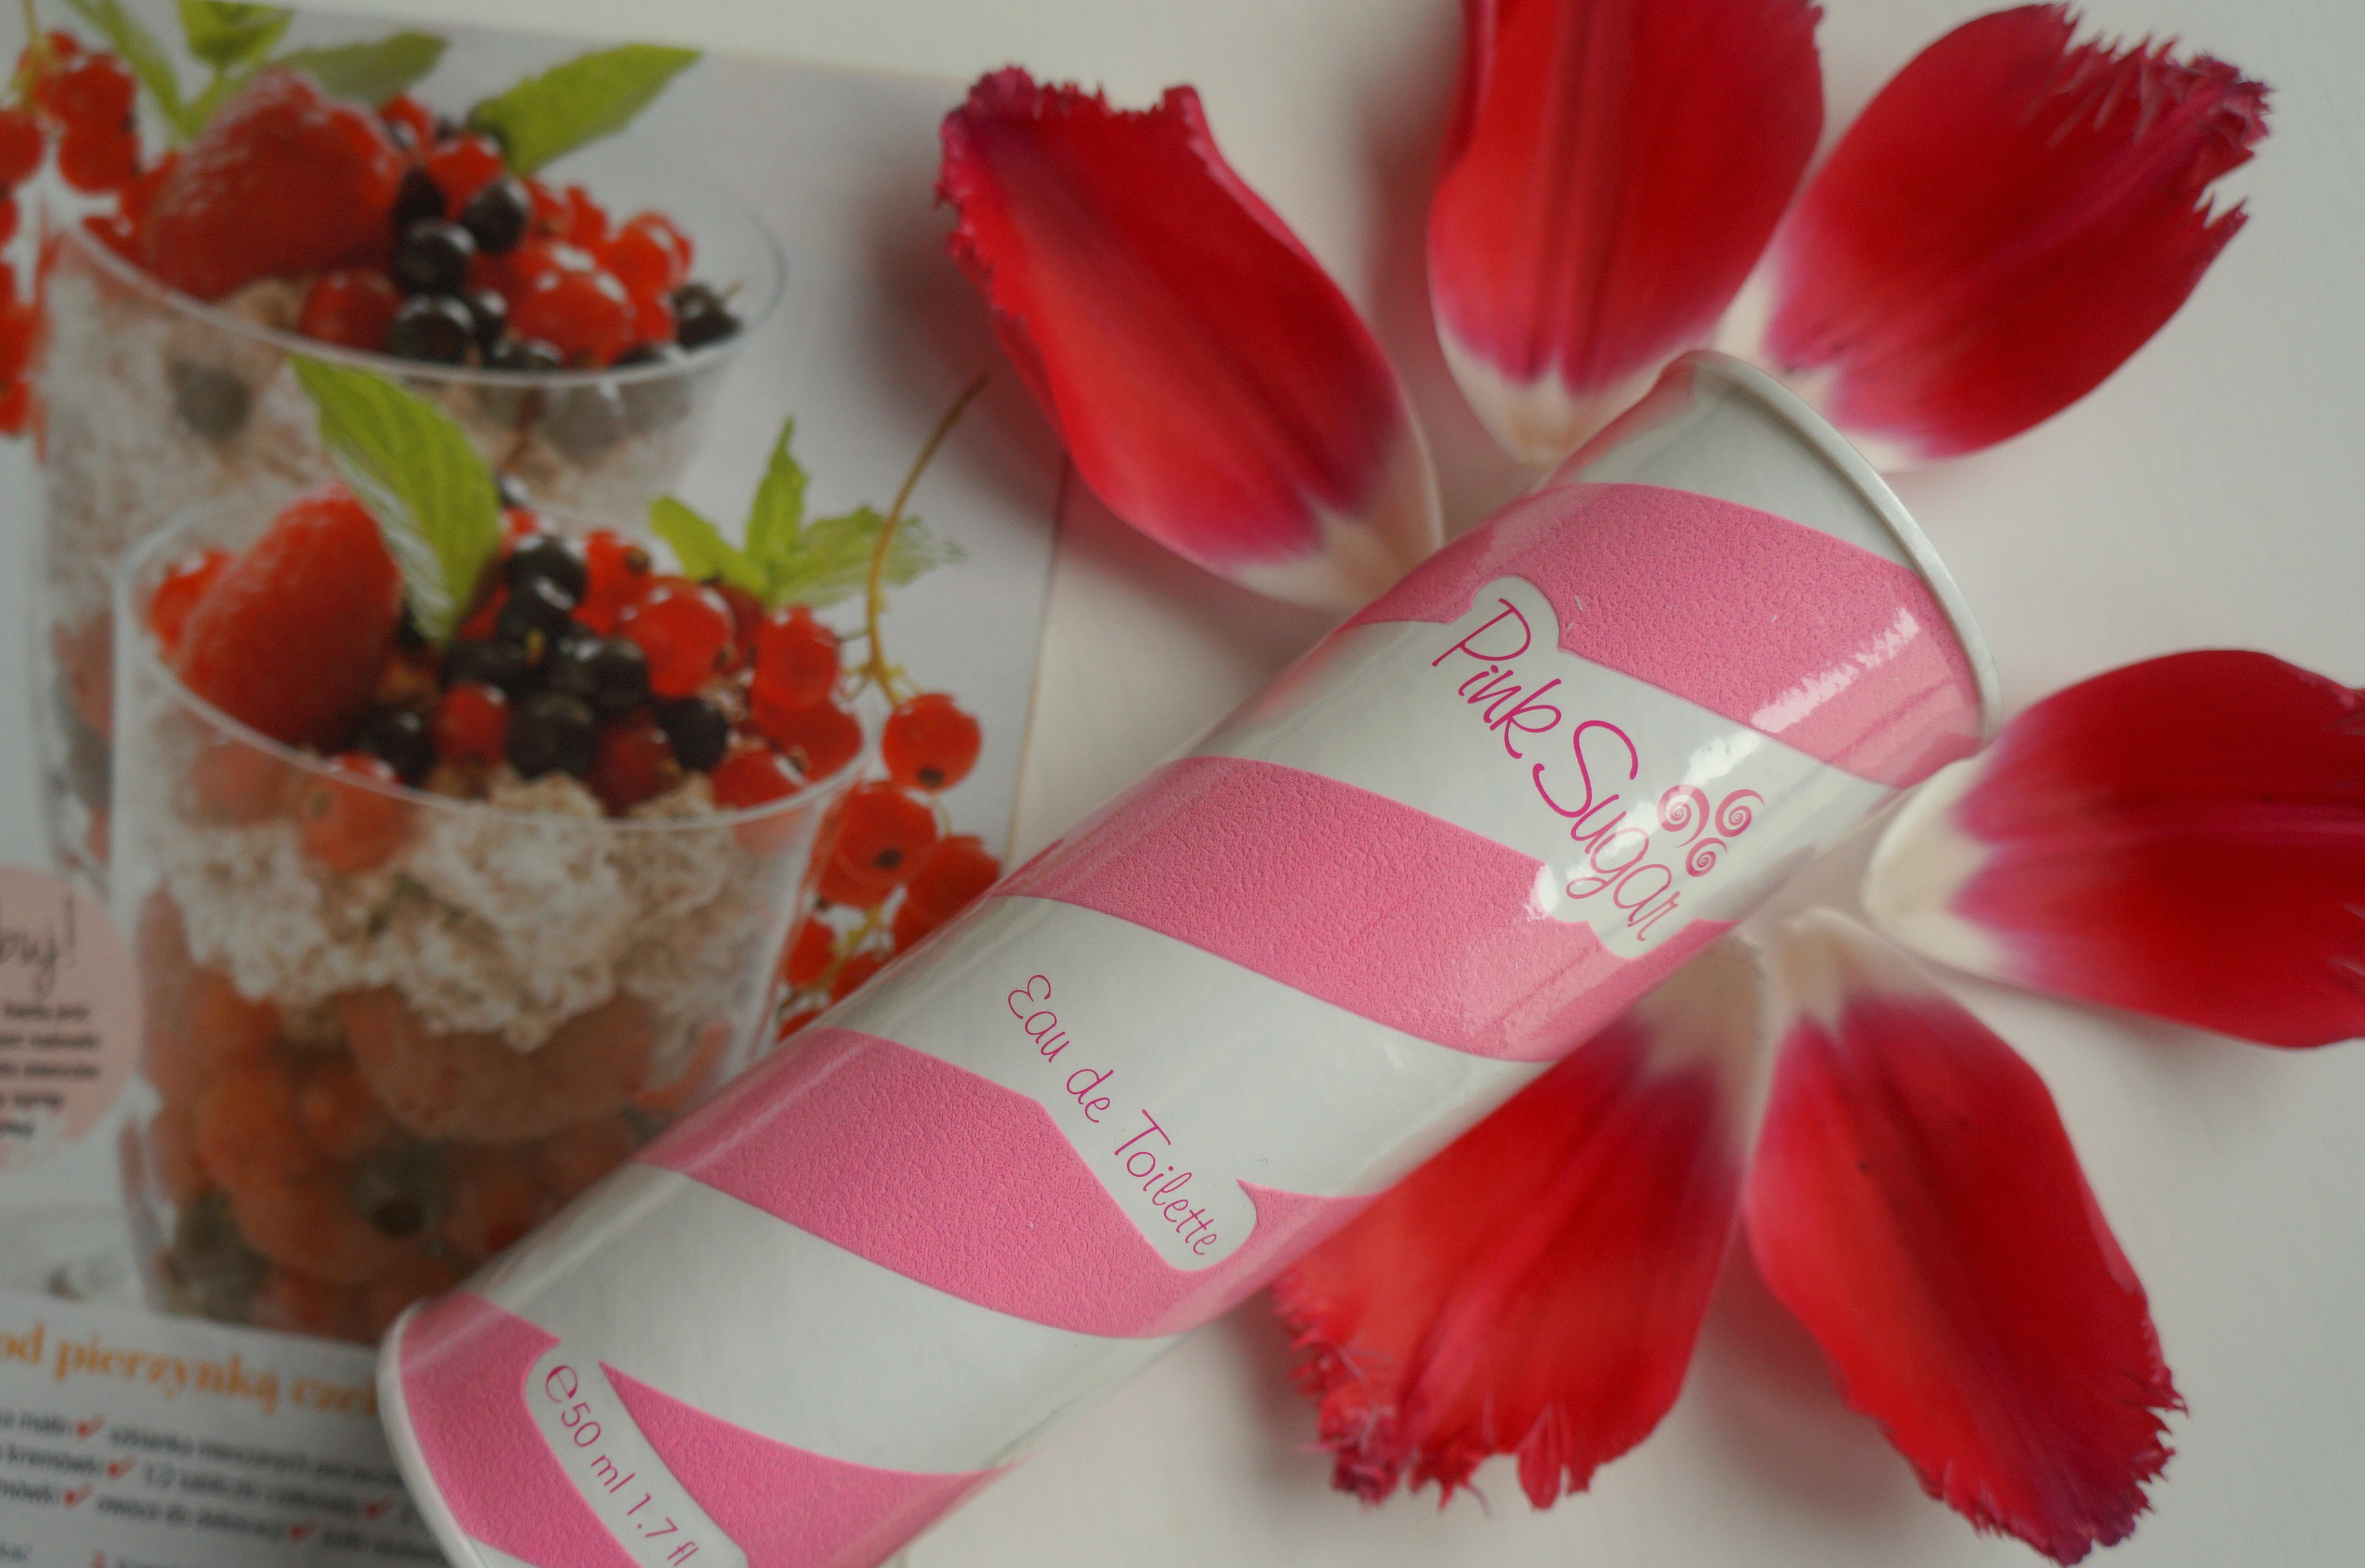 aquolina-pink-sugar-konkurs